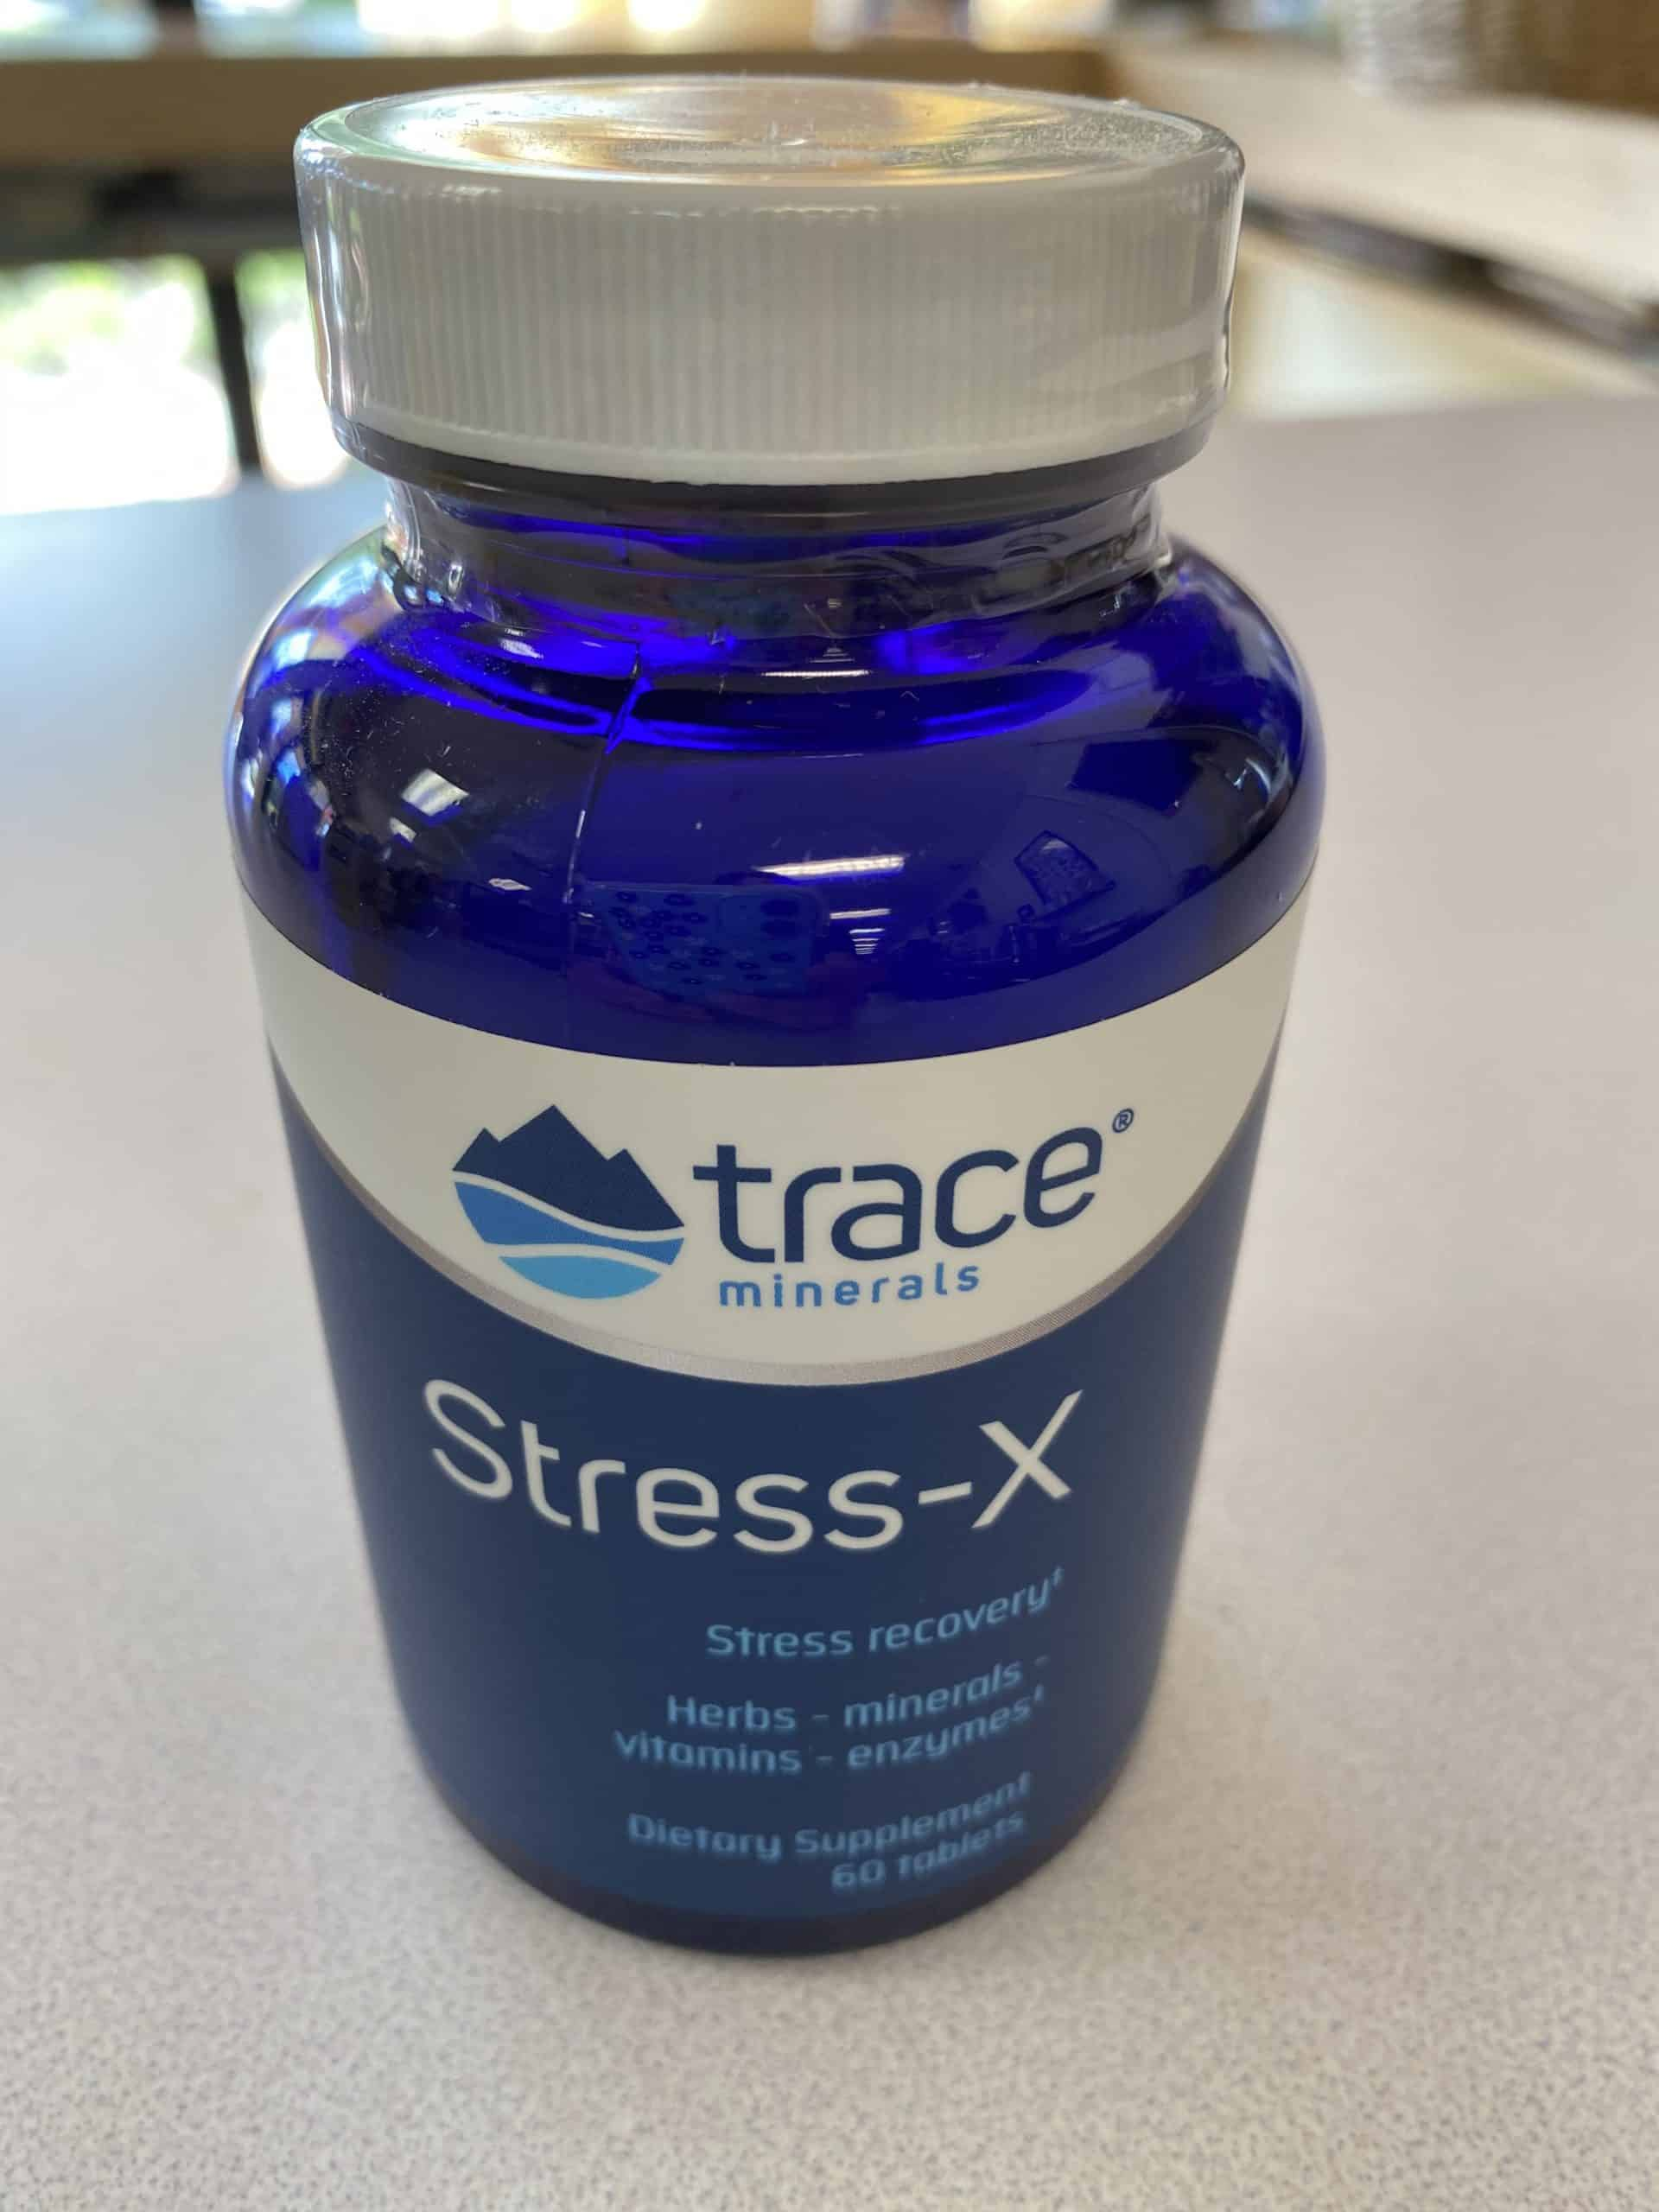 Stress Relief - Trace minerals - Stress-X